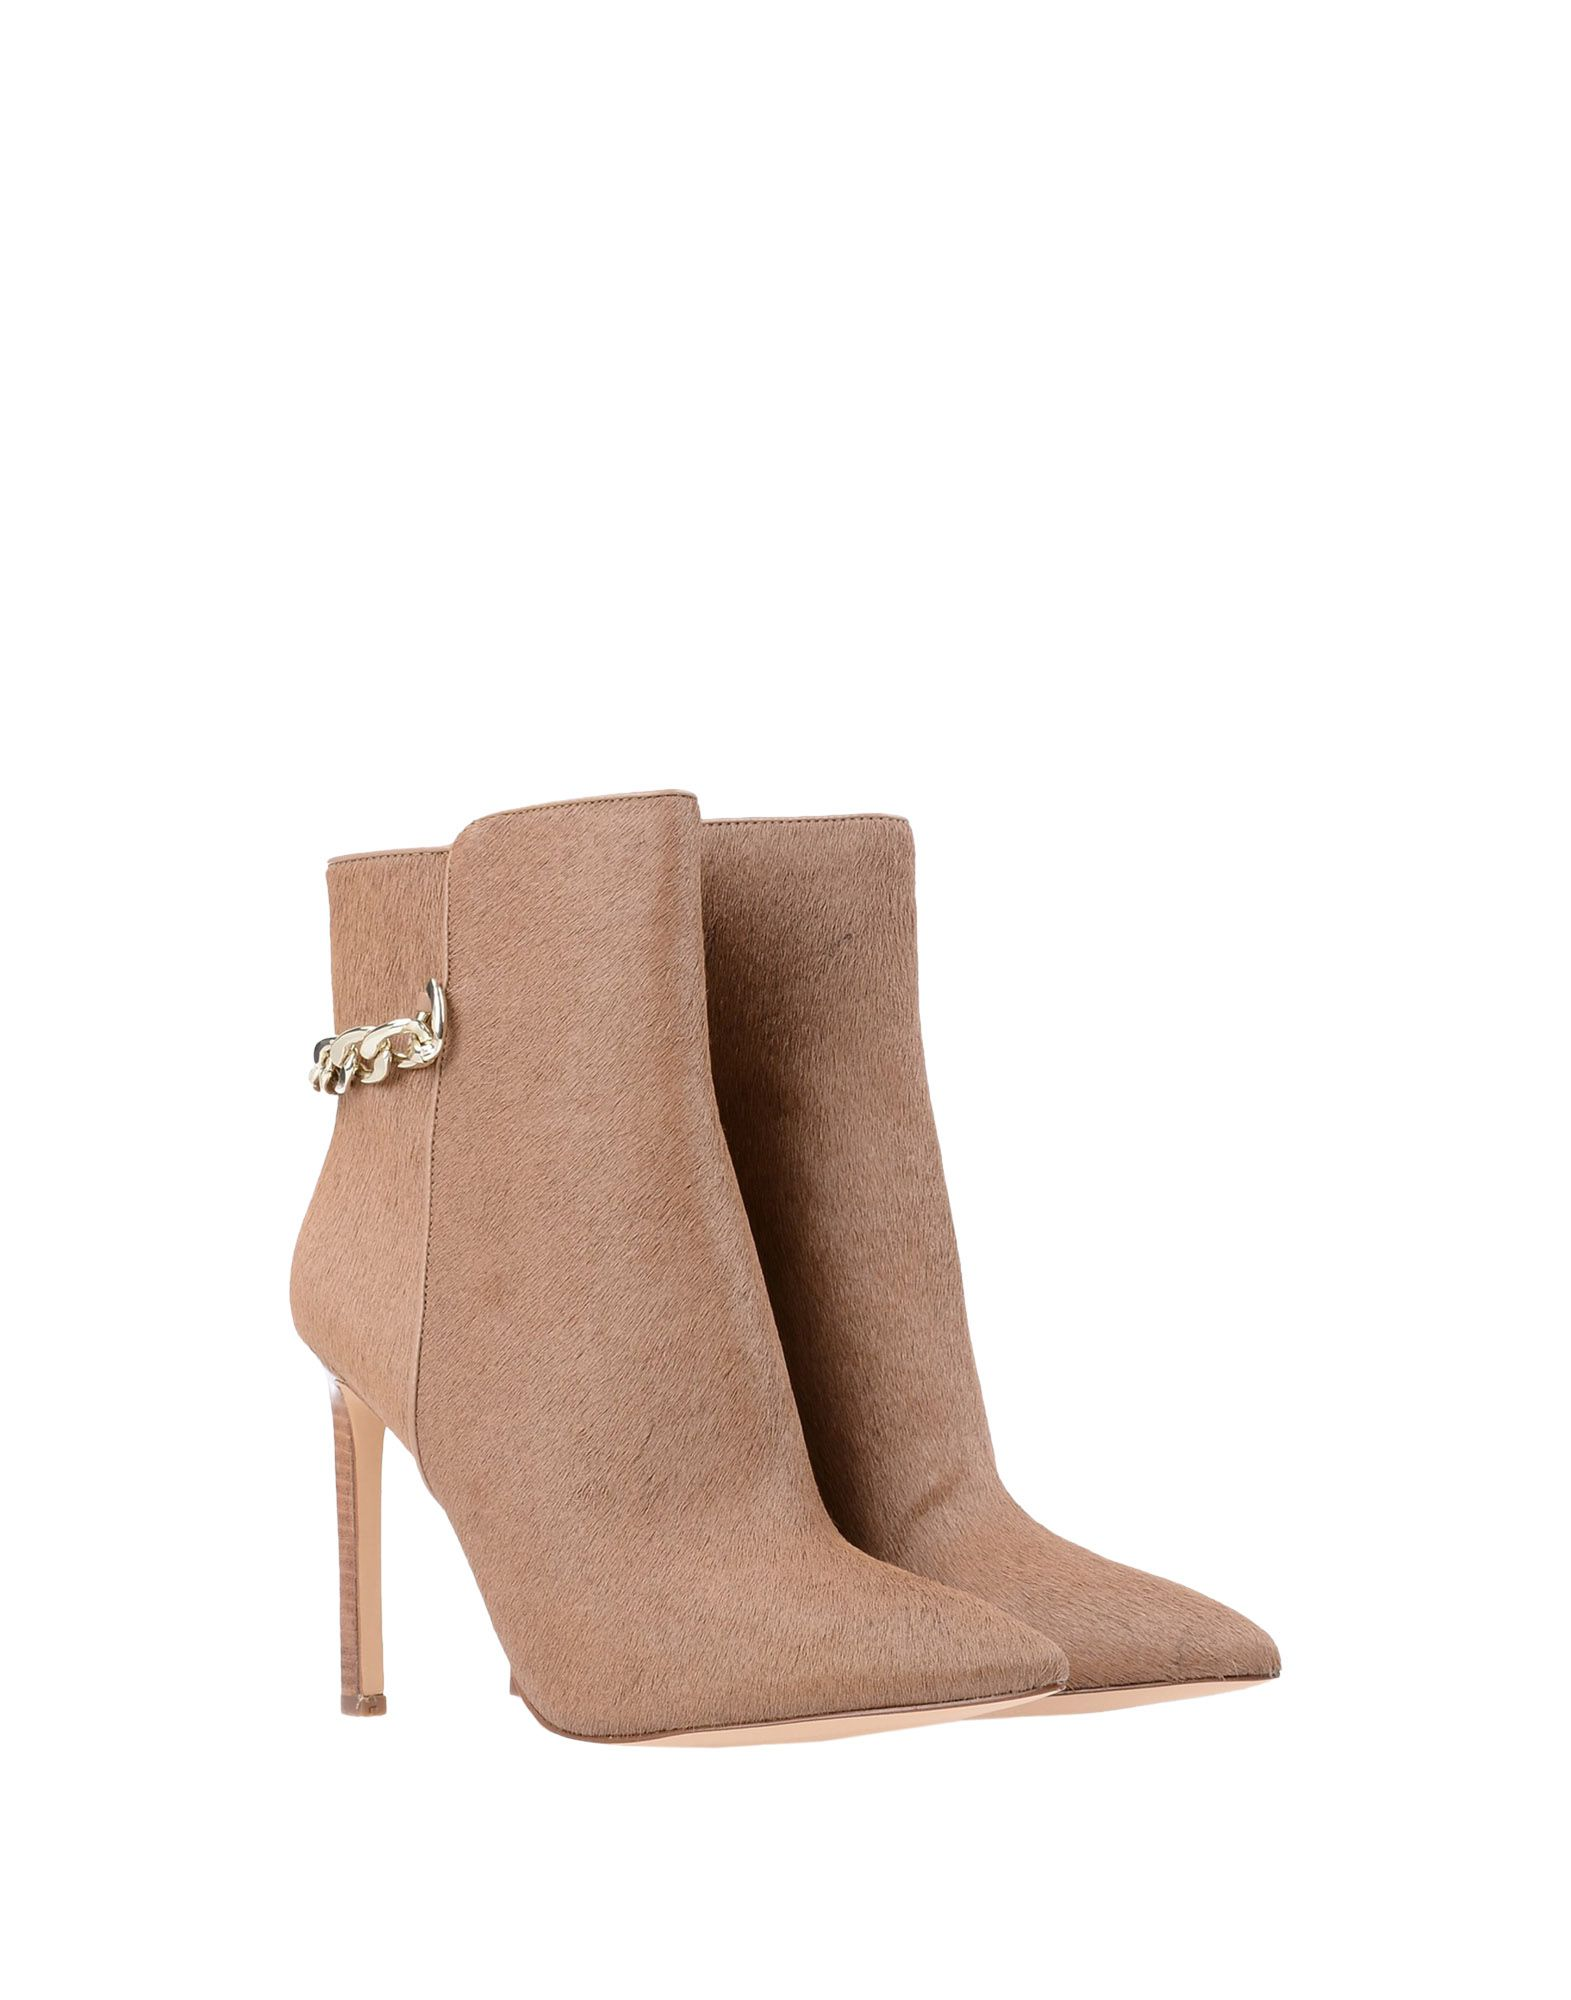 Stilvolle billige Schuhe Nine West Stiefelette Damen  11330772OO